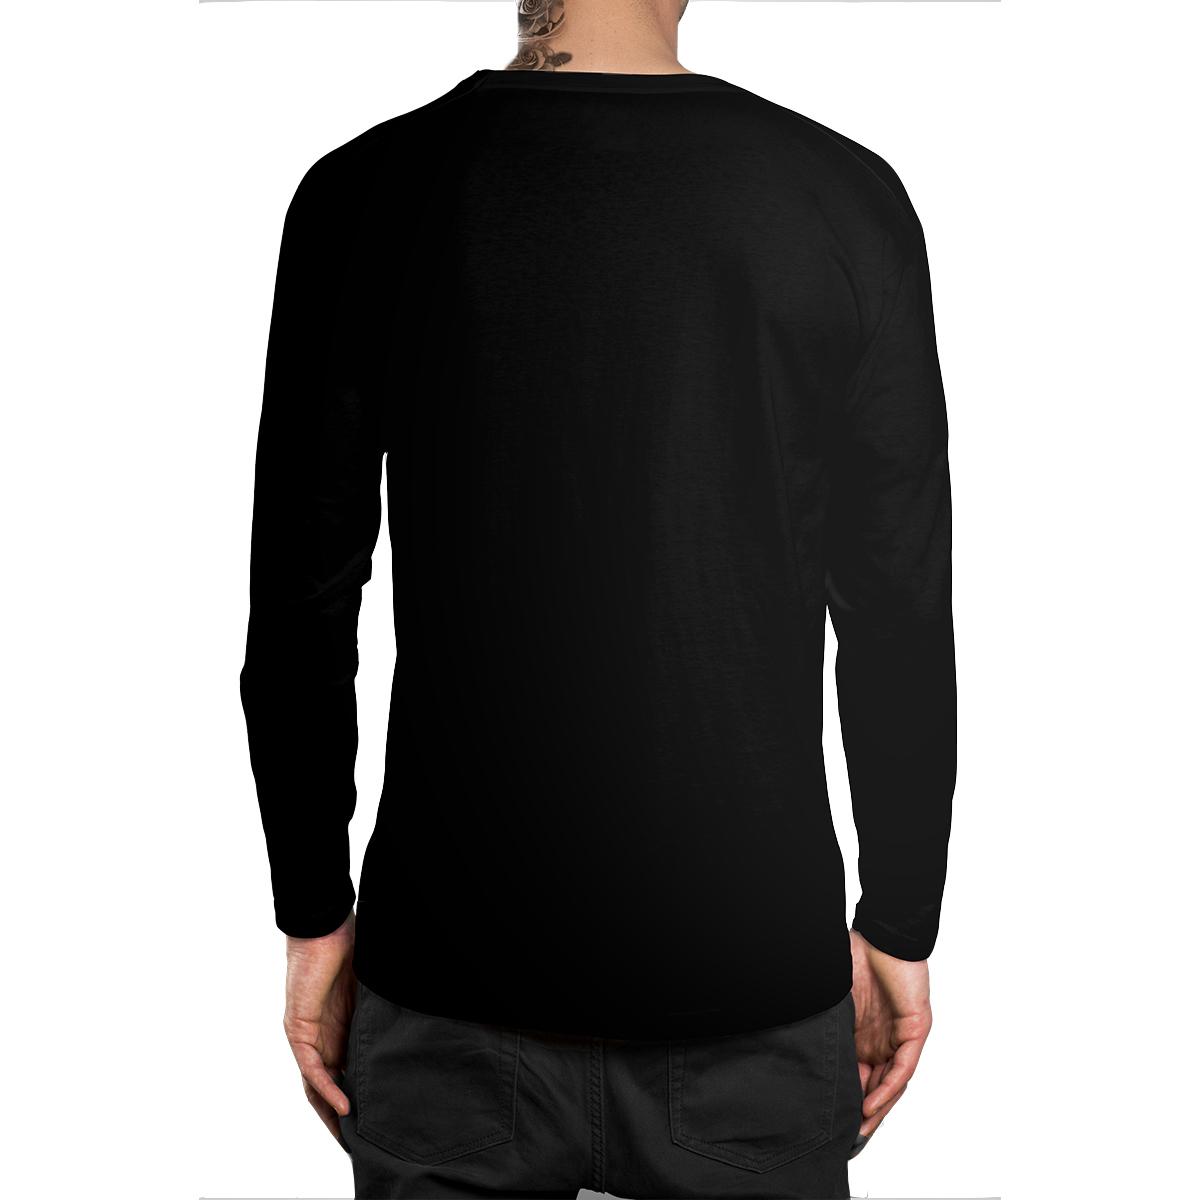 Stompy Camiseta Manga Longa Modelo 27